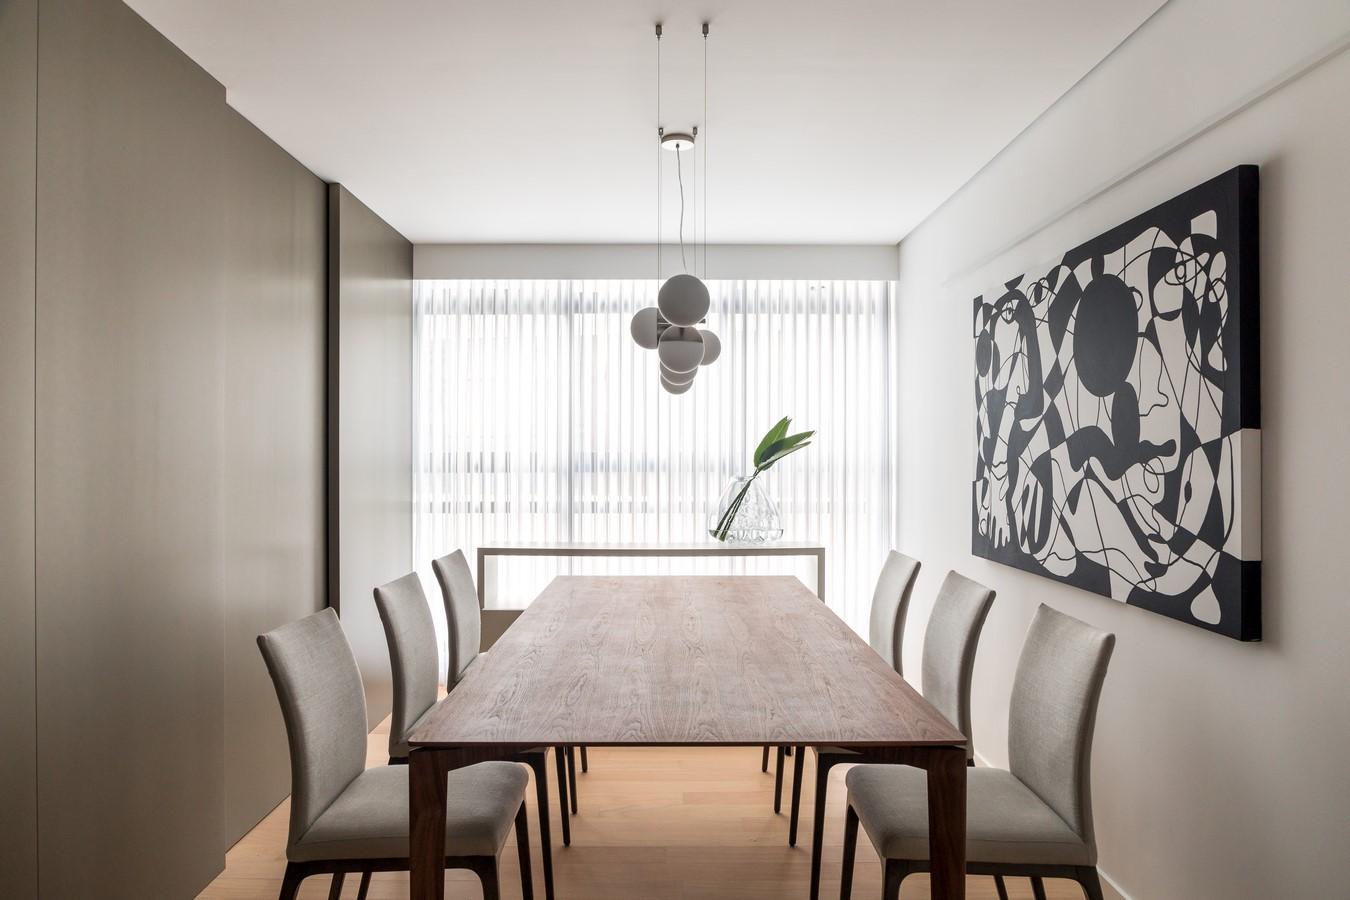 Apartamento RC by Schuchovski Arquitetura - Sheet1